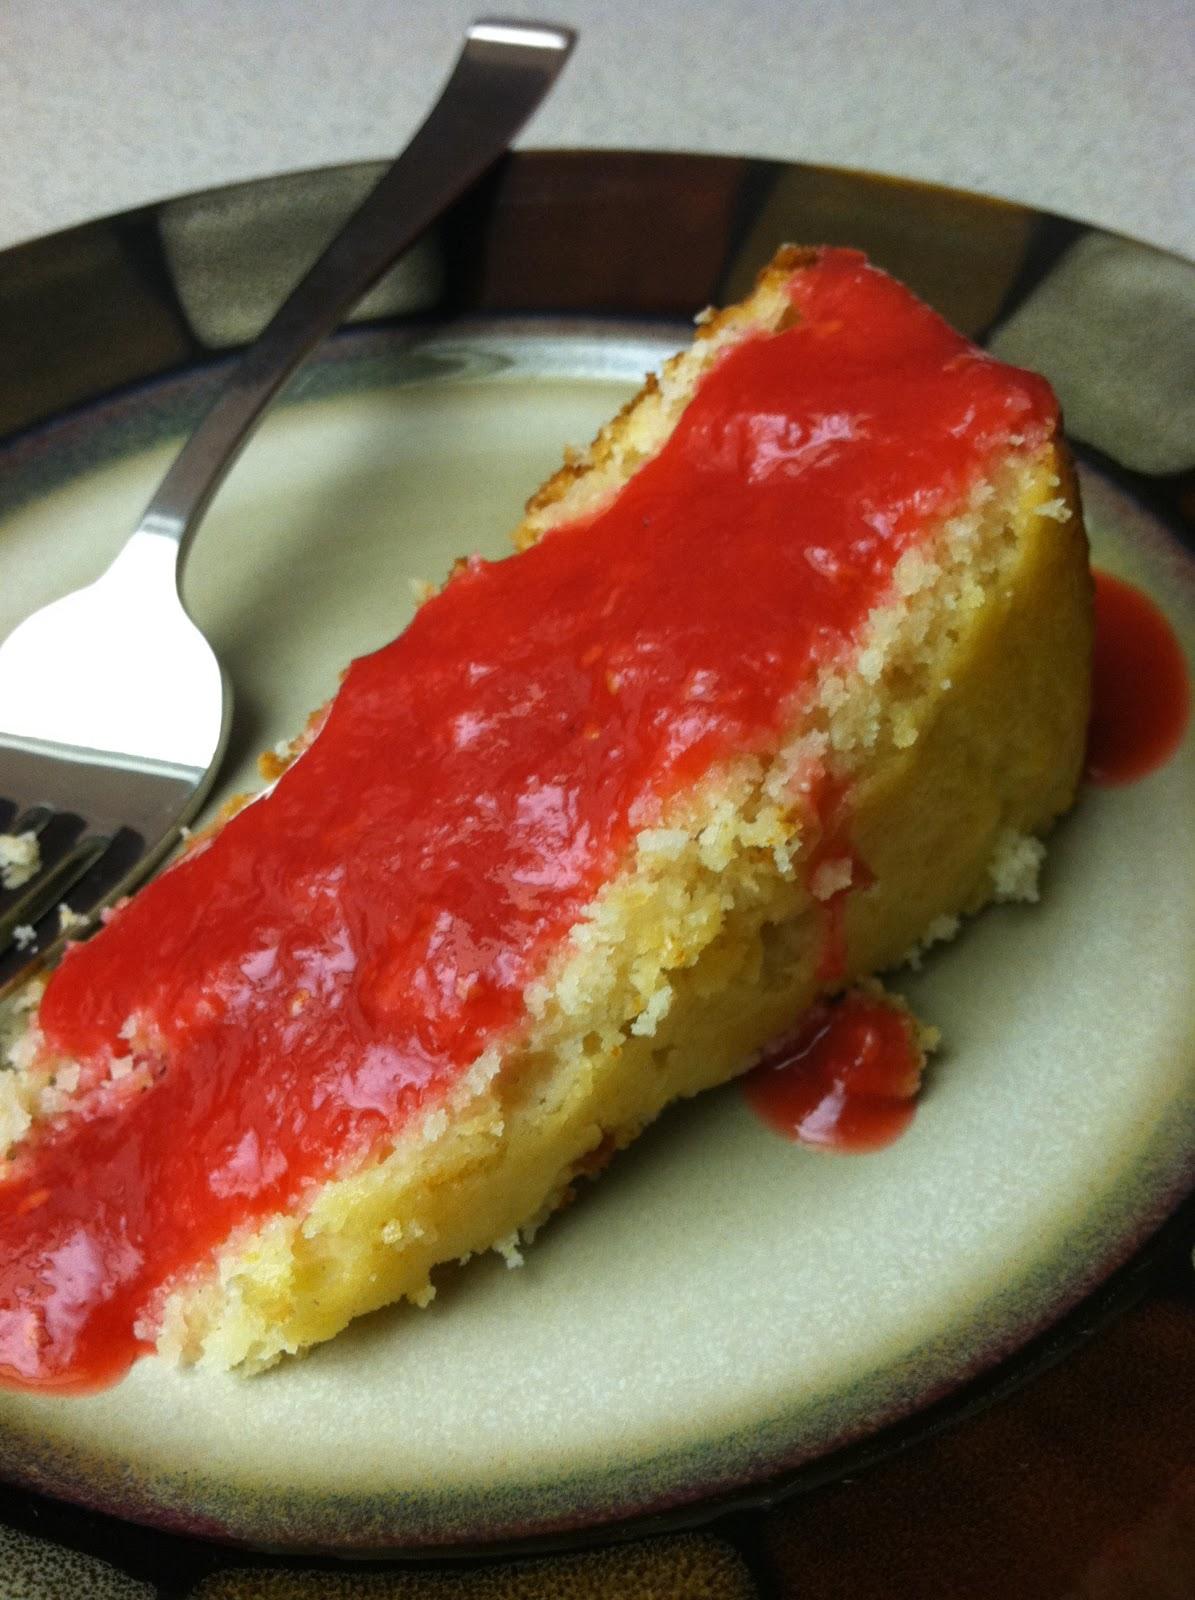 ... the Fast Lane: Week 28: Citrus - Lime Yogurt Cake with Raspberry Sauce